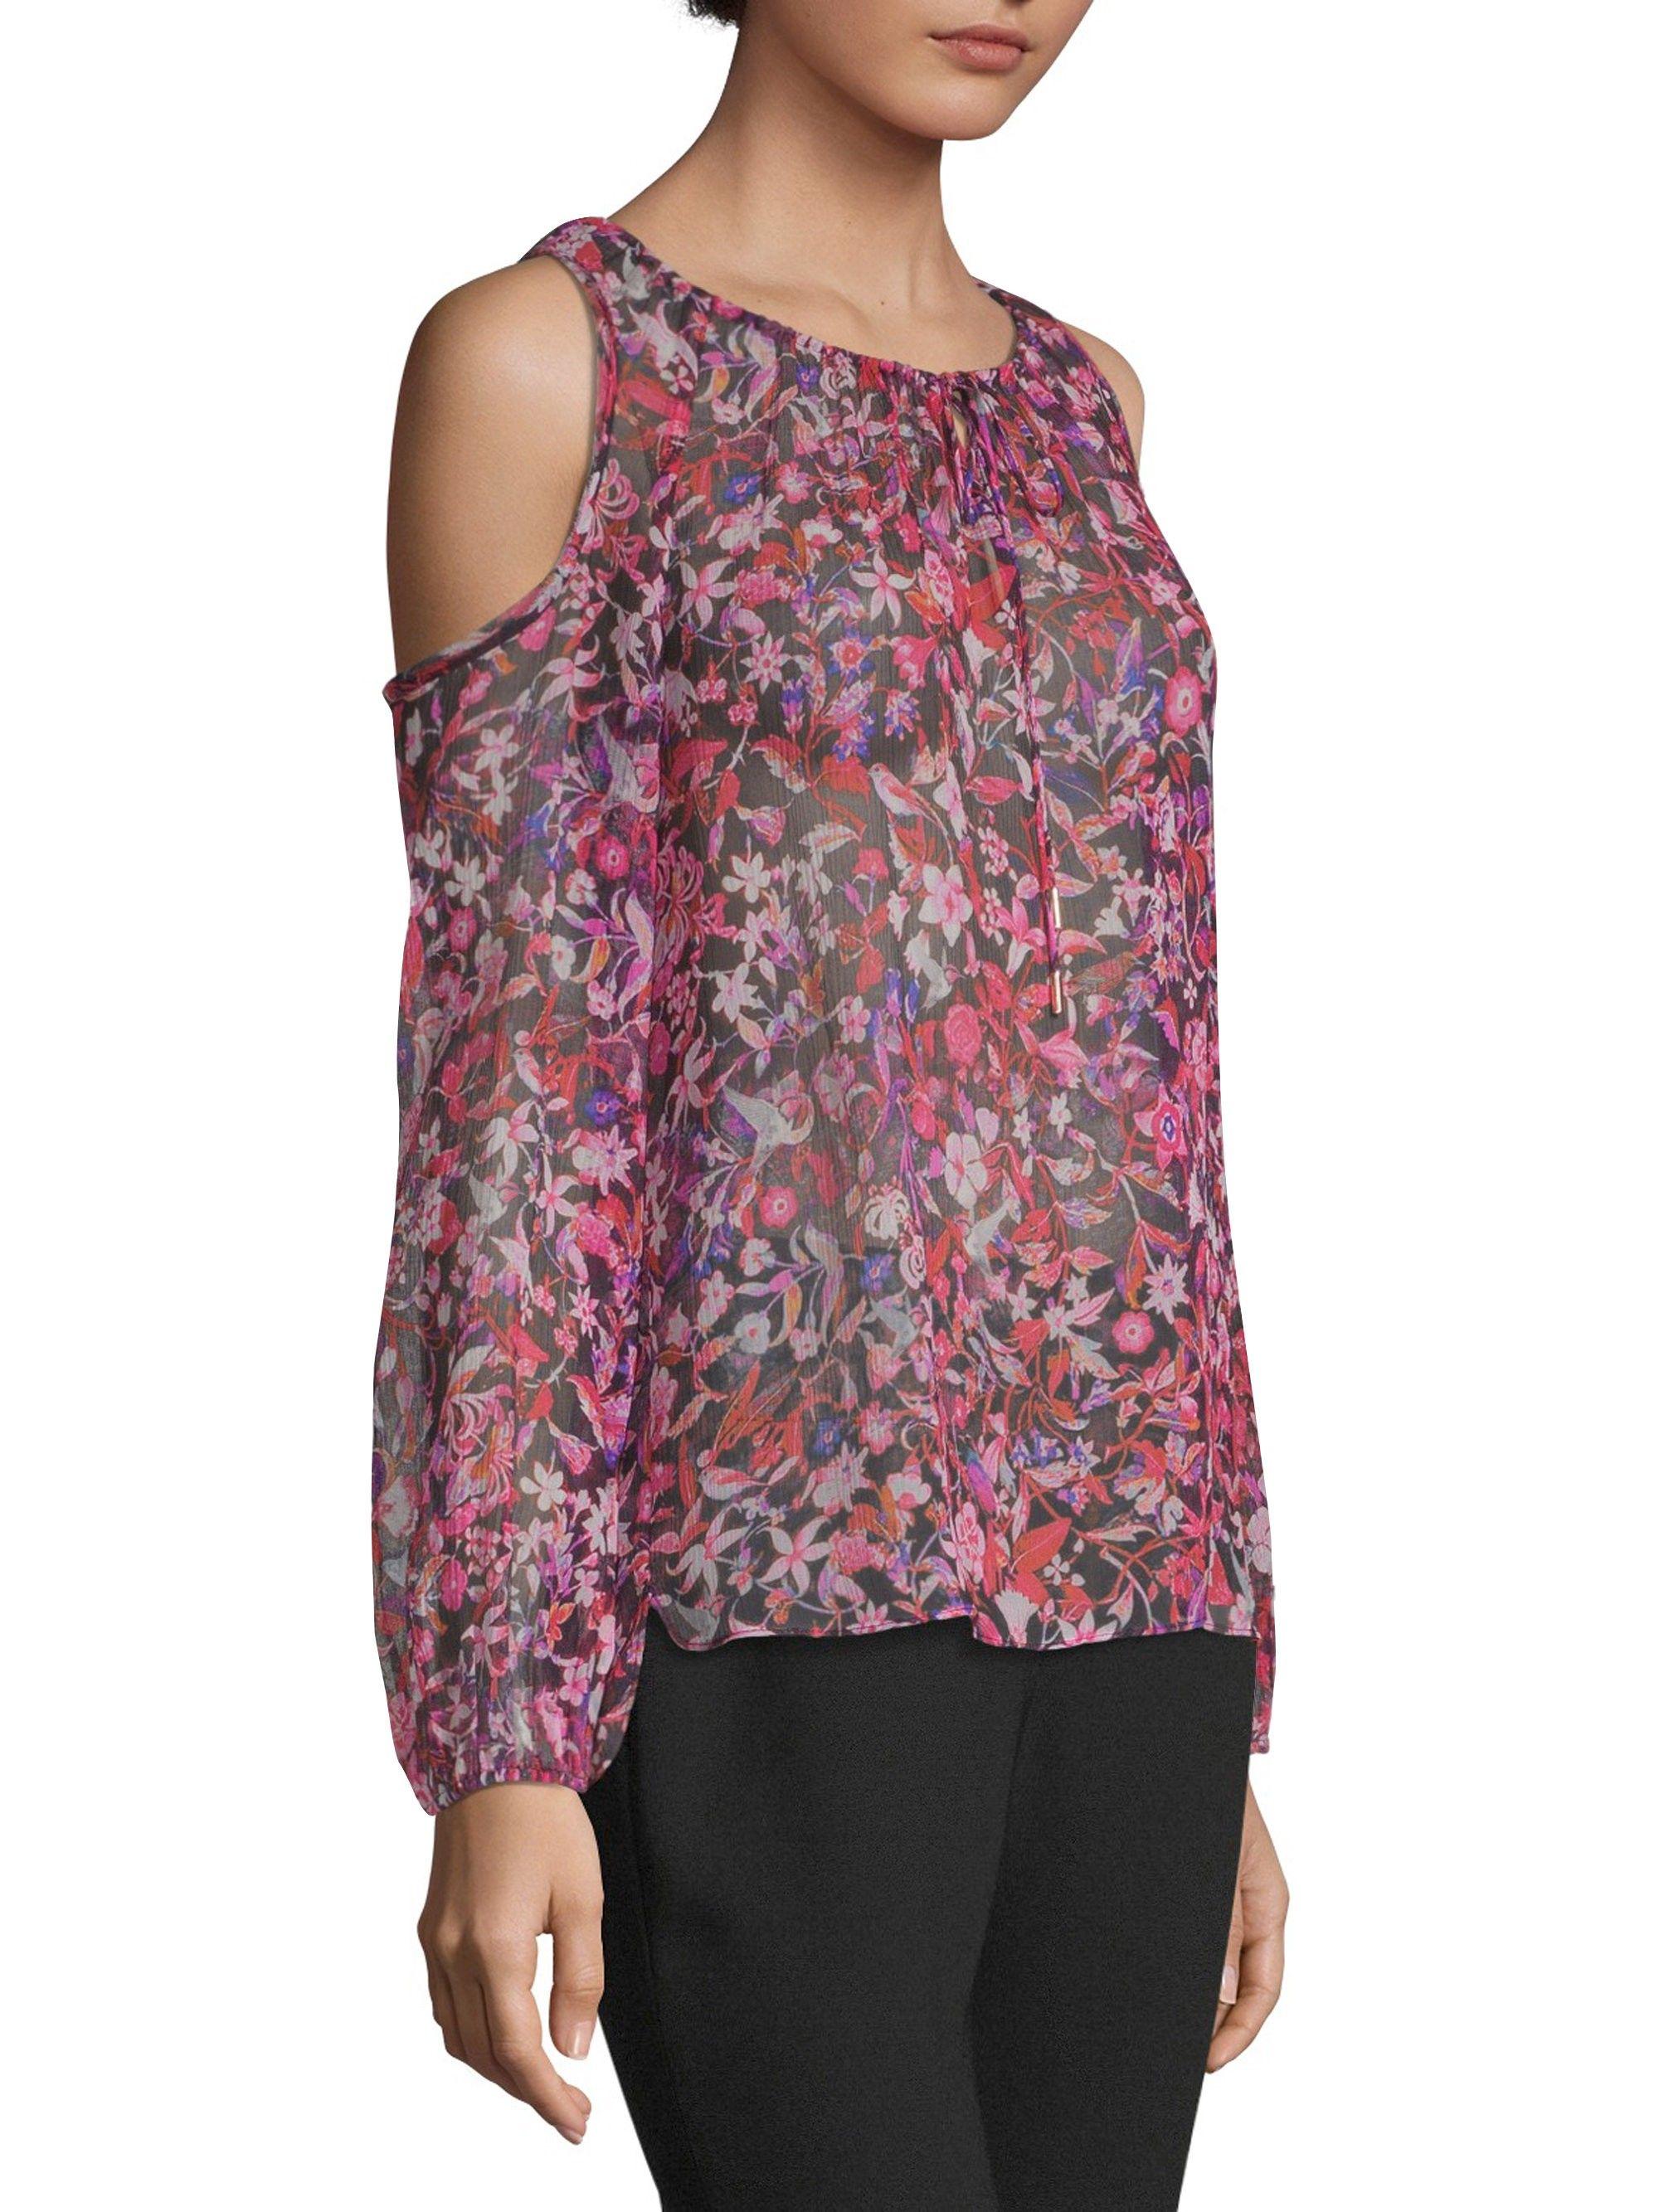 5654816fef5239 Elie Tahari Cathy Cold-Shoulder Silk Blouse - Bright Petun X-Large